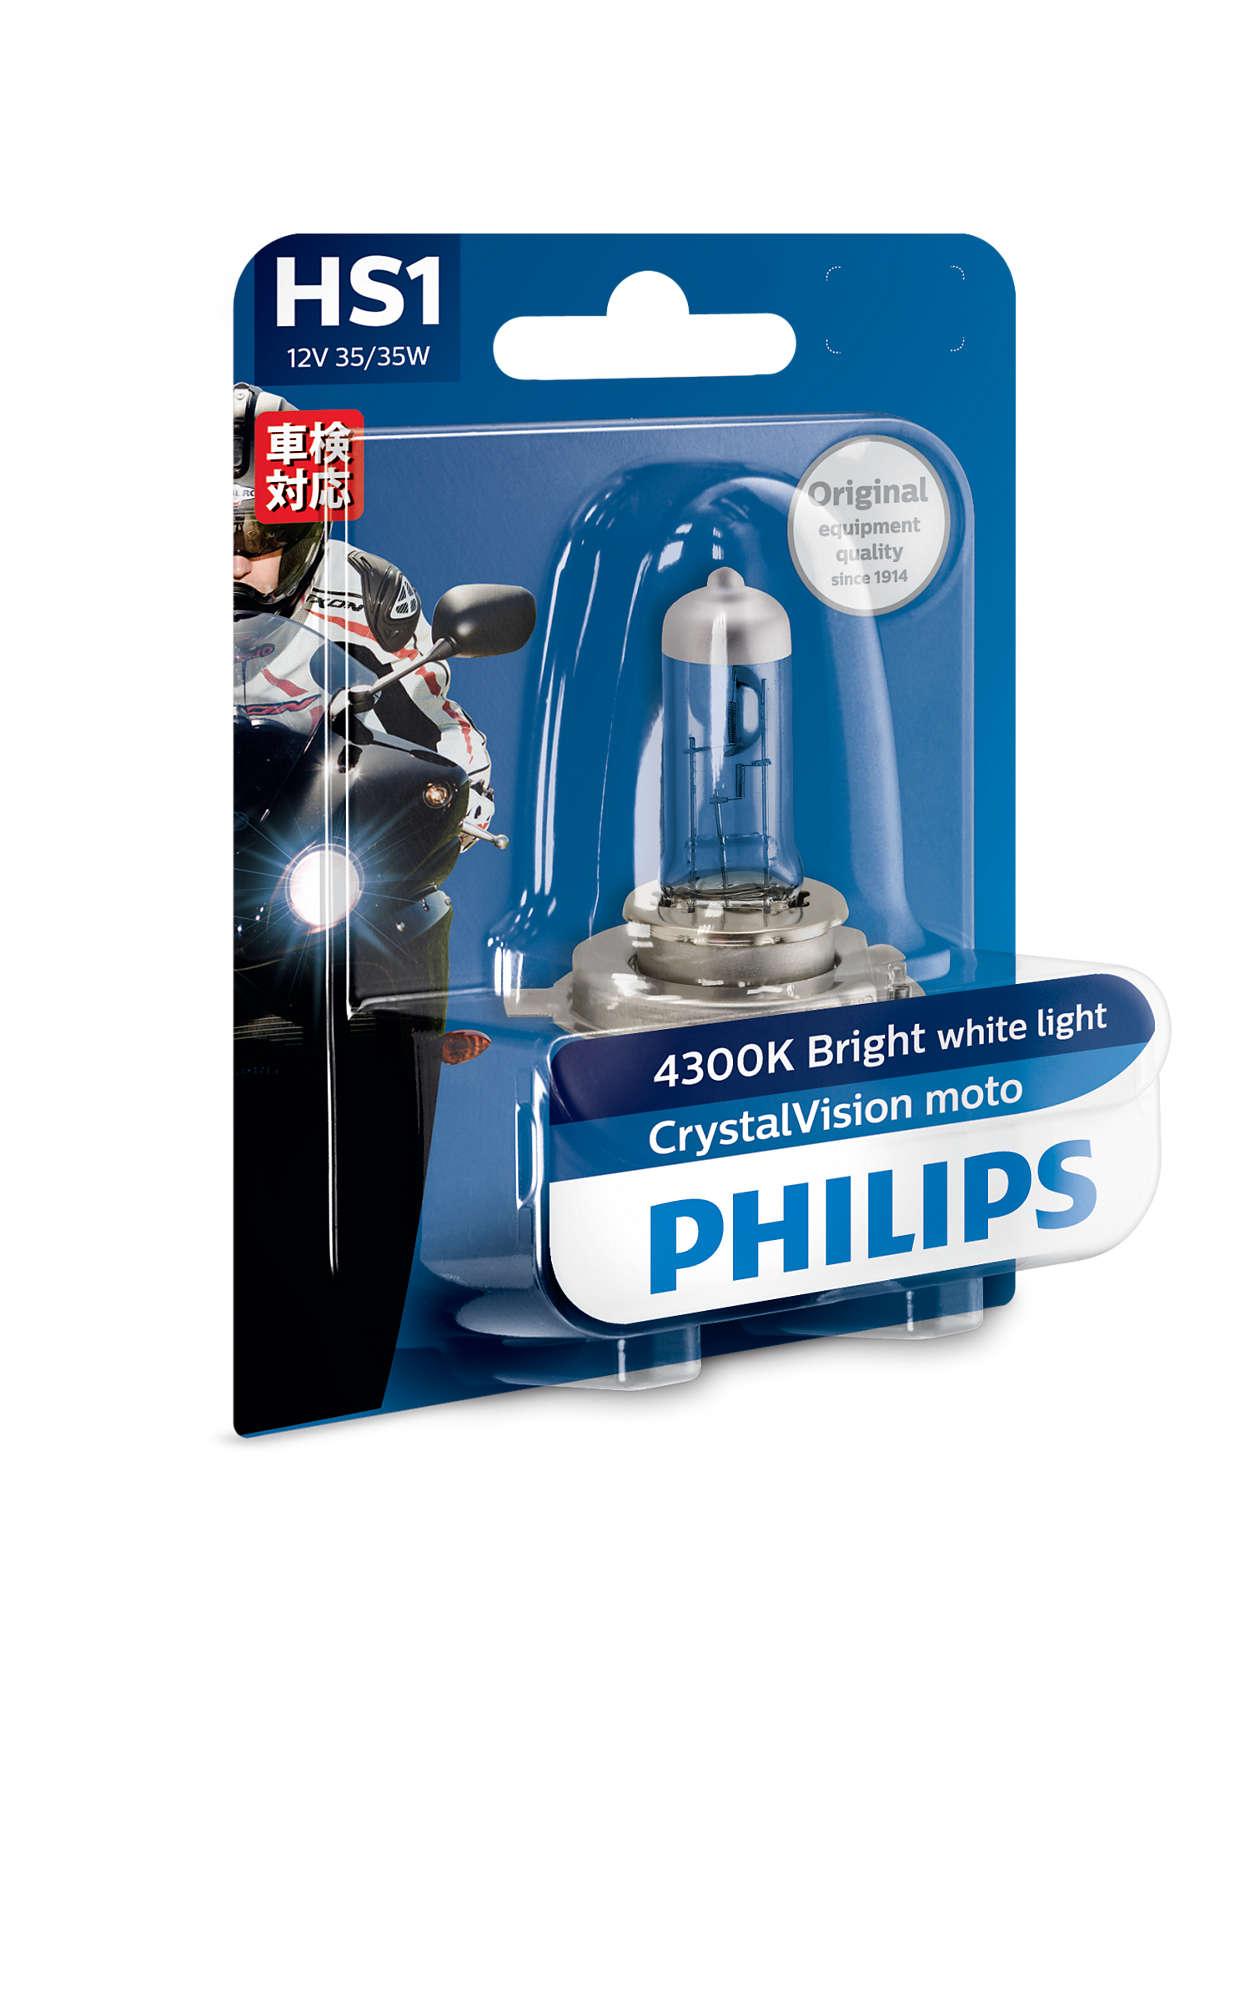 Crystalvision moto motorcycle headlights cvb philips